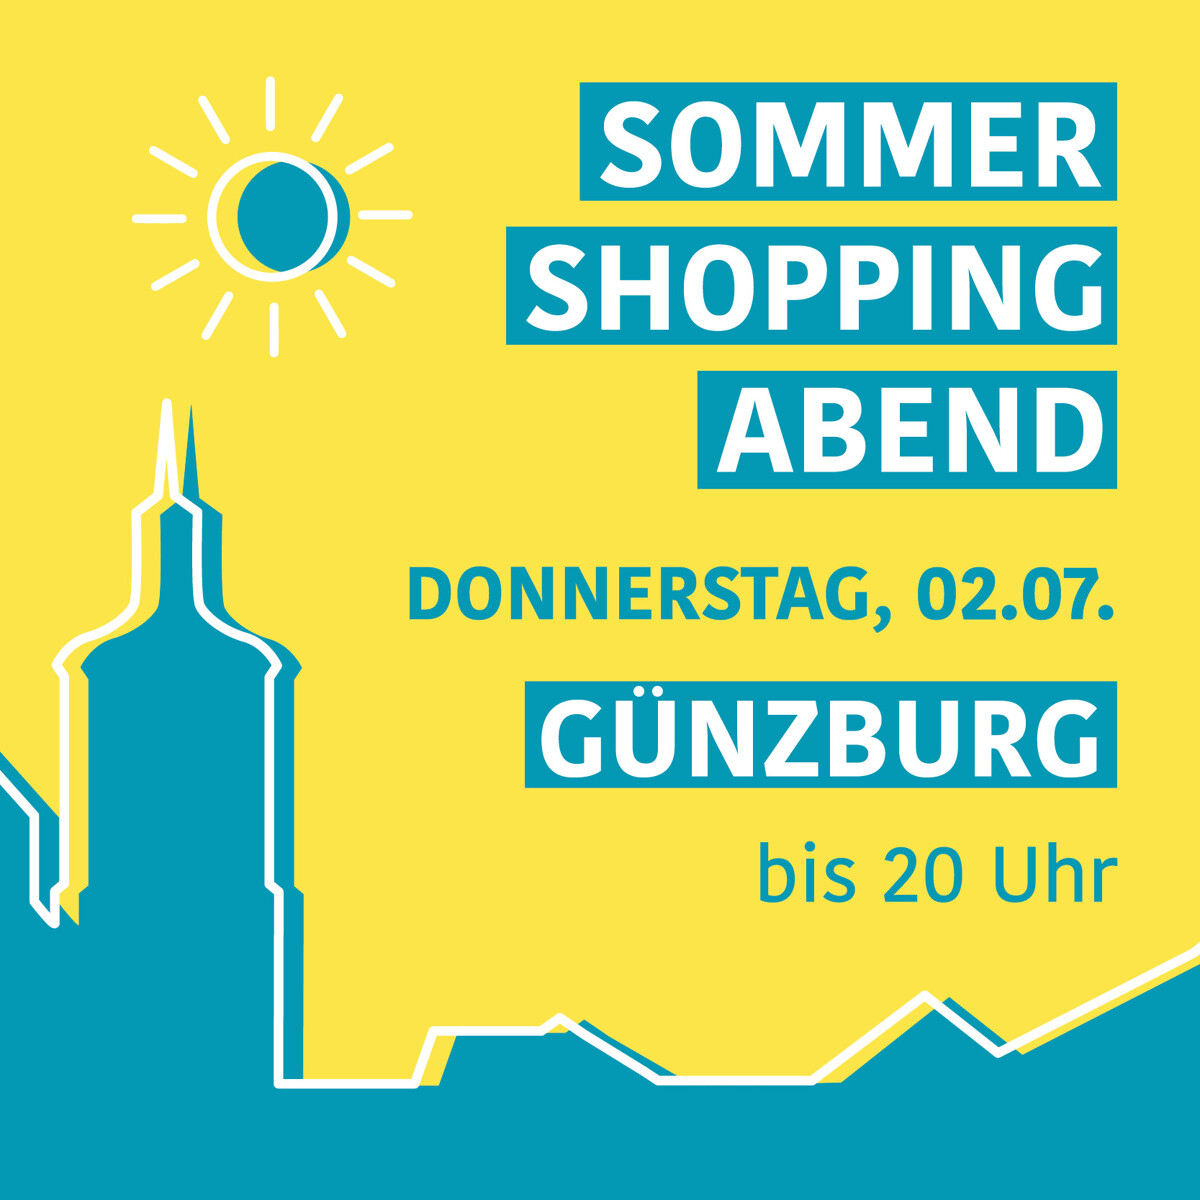 Sommer Shopping Abend